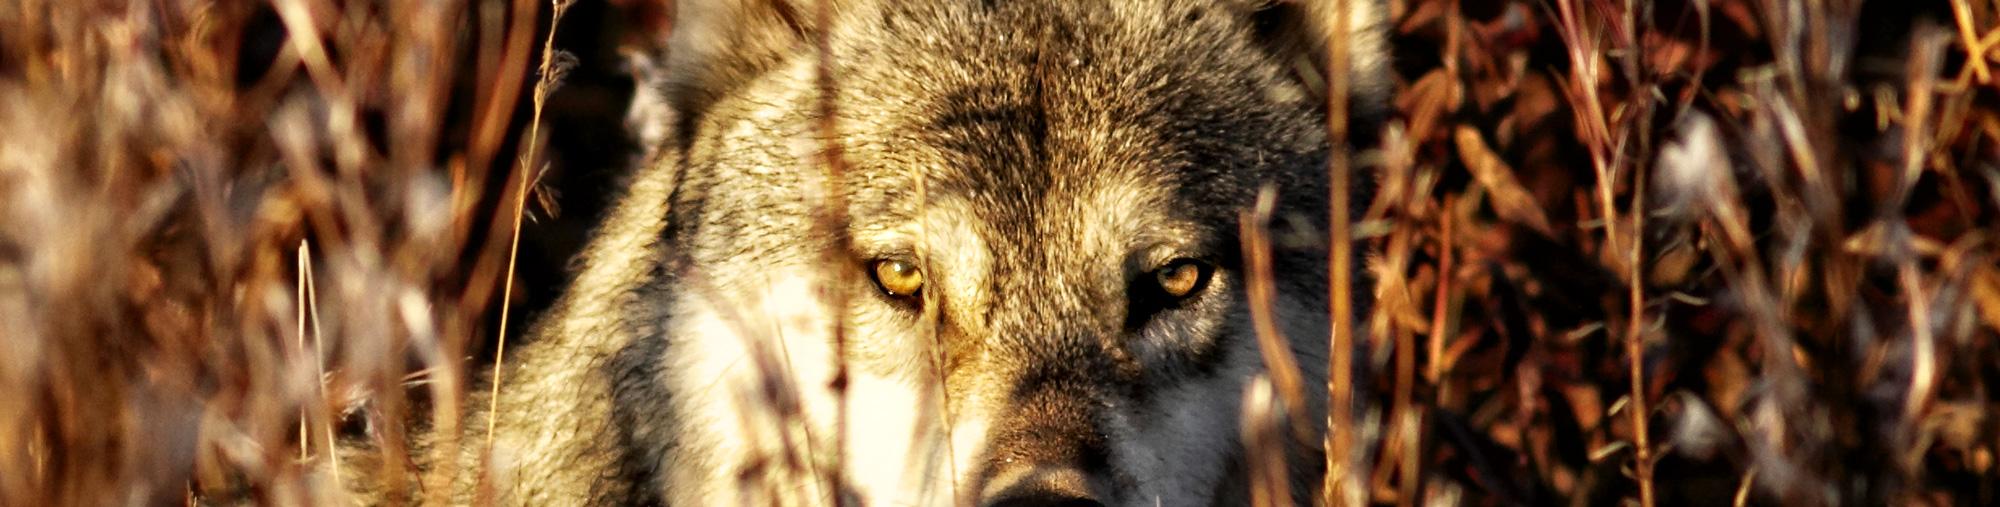 h2-wolf4CU.jpg